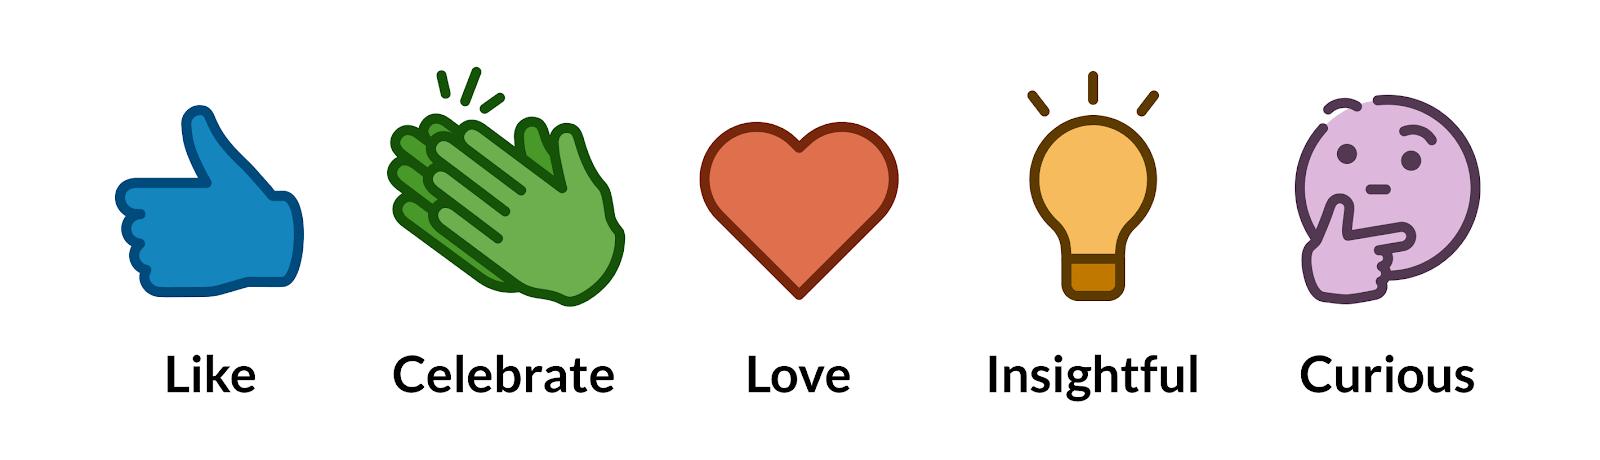 linkedin emoji reactions - like, celebrate, love, insightful, and curious